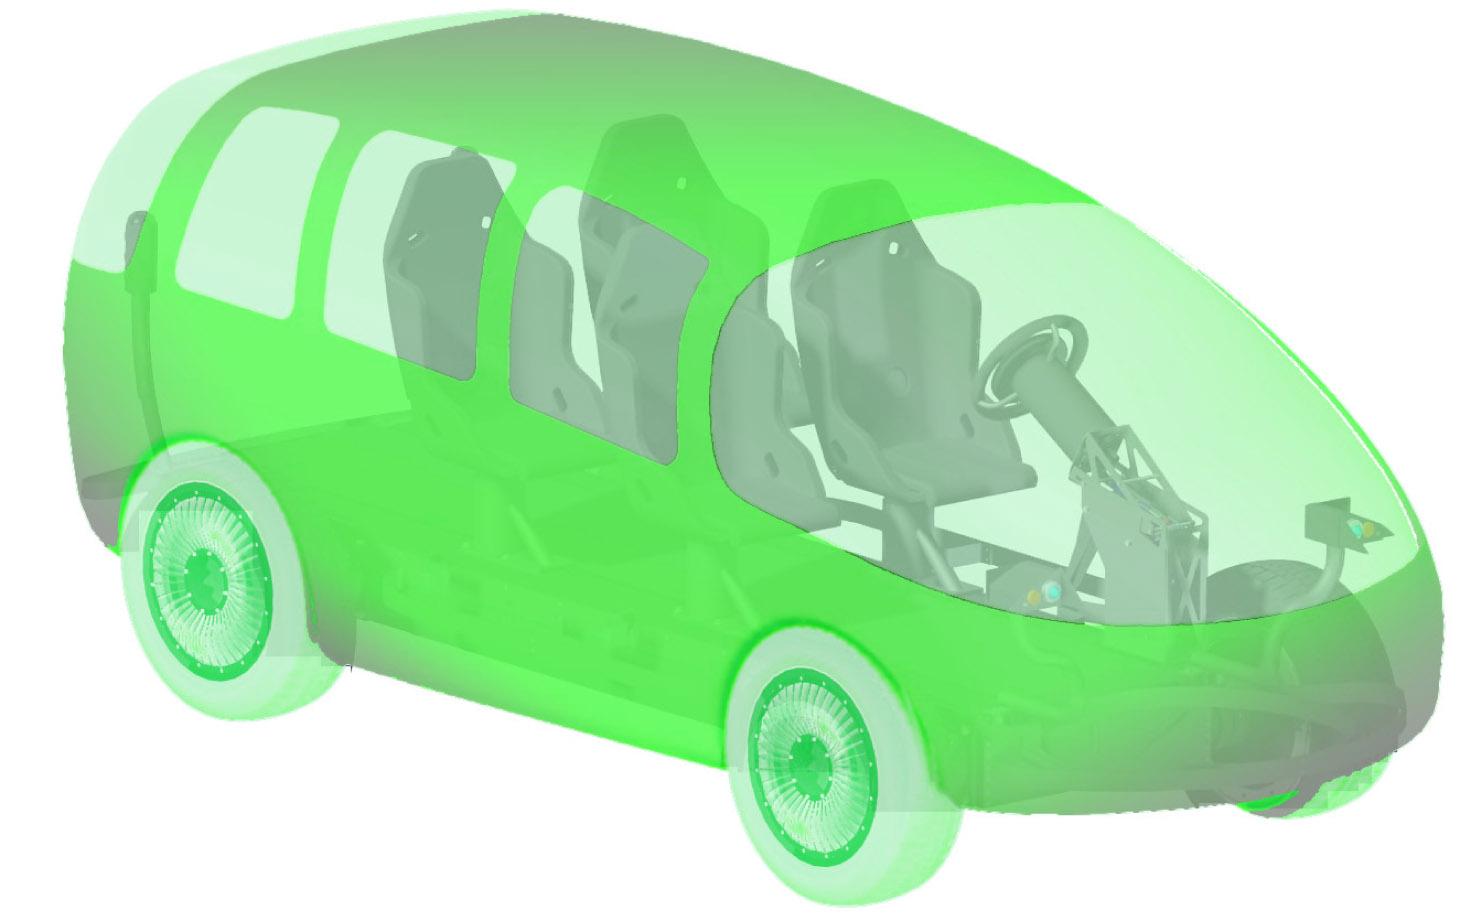 das Hermetic Drive Vehicle